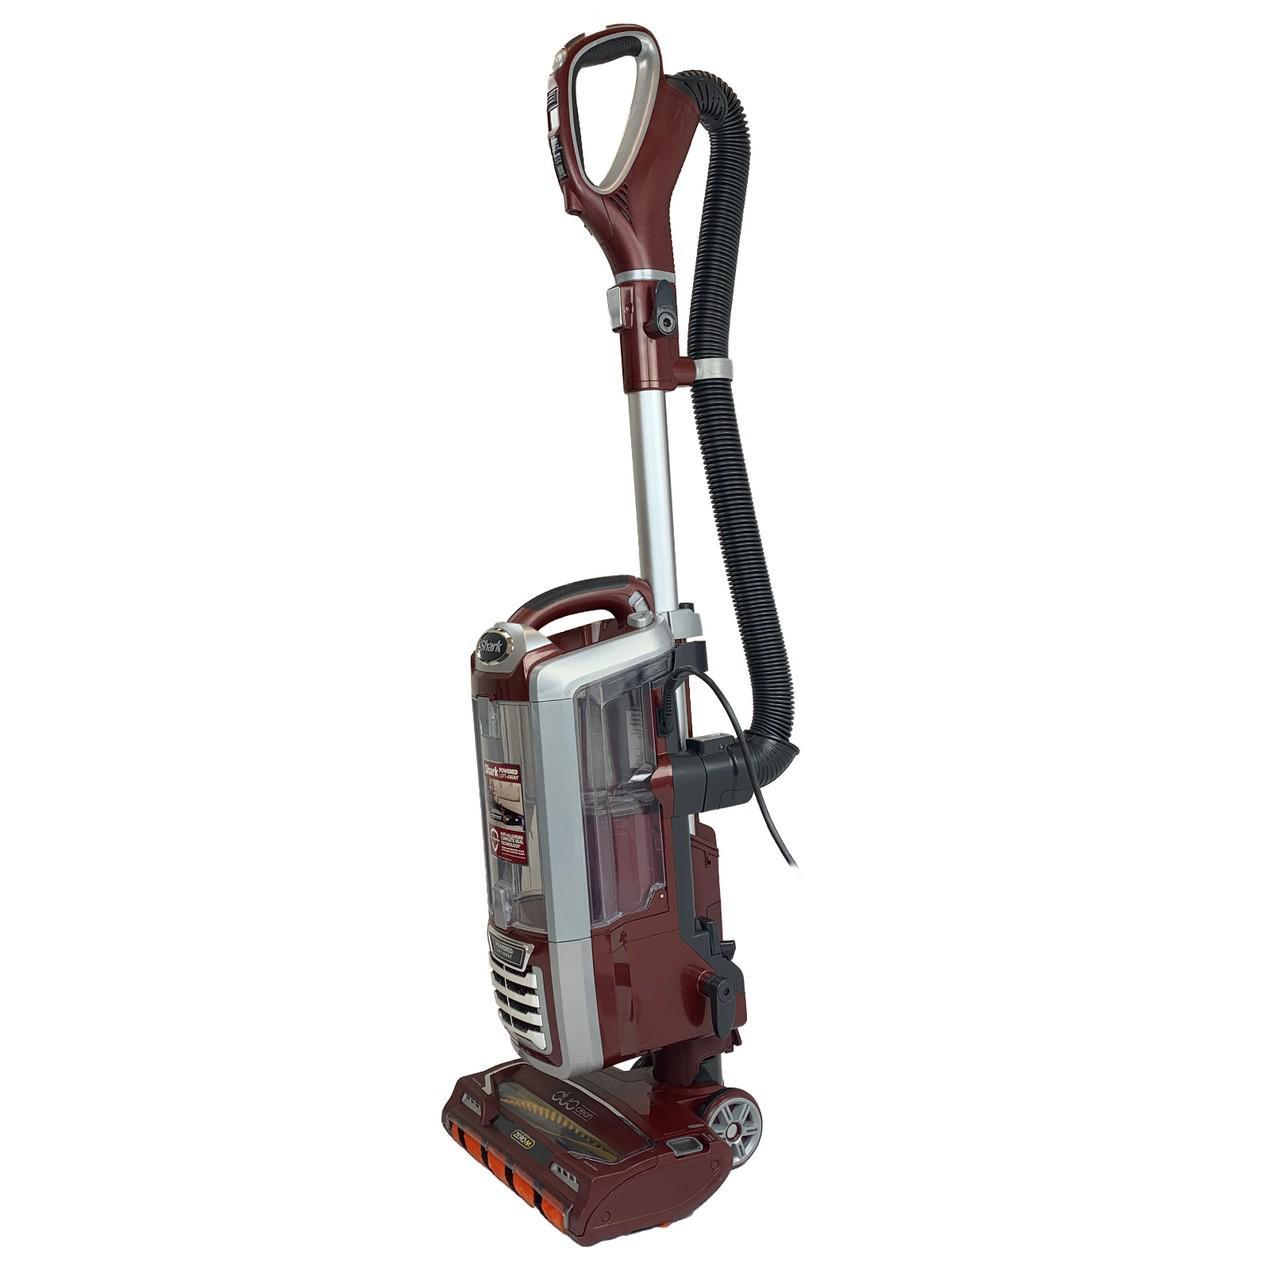 Upright wireless vacuum cleaner SHARK ZU881 DuoClean